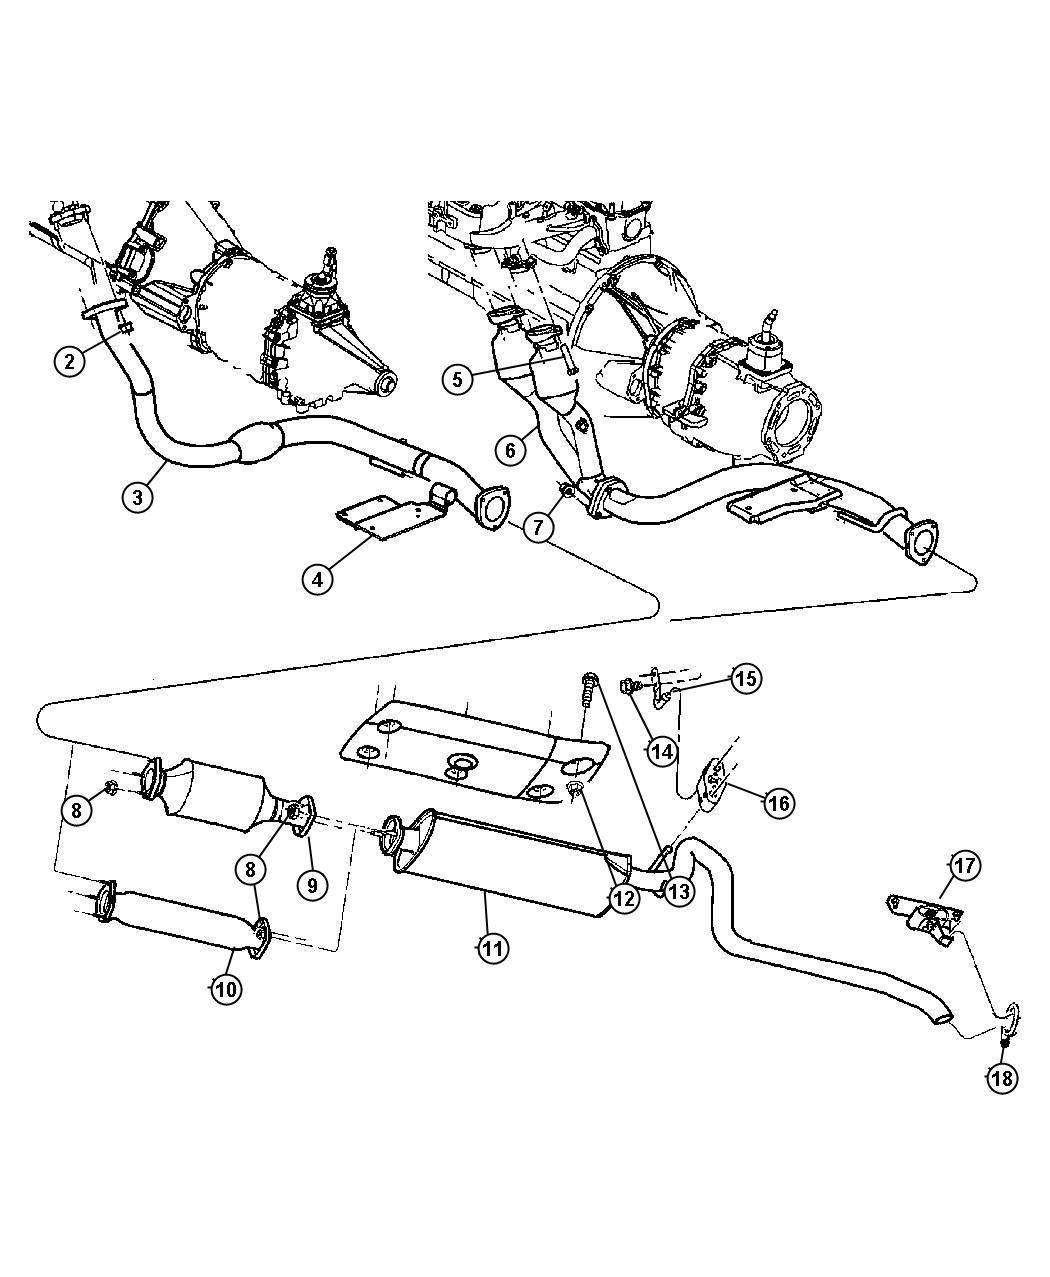 1999 jeep 2.5l engine diagram